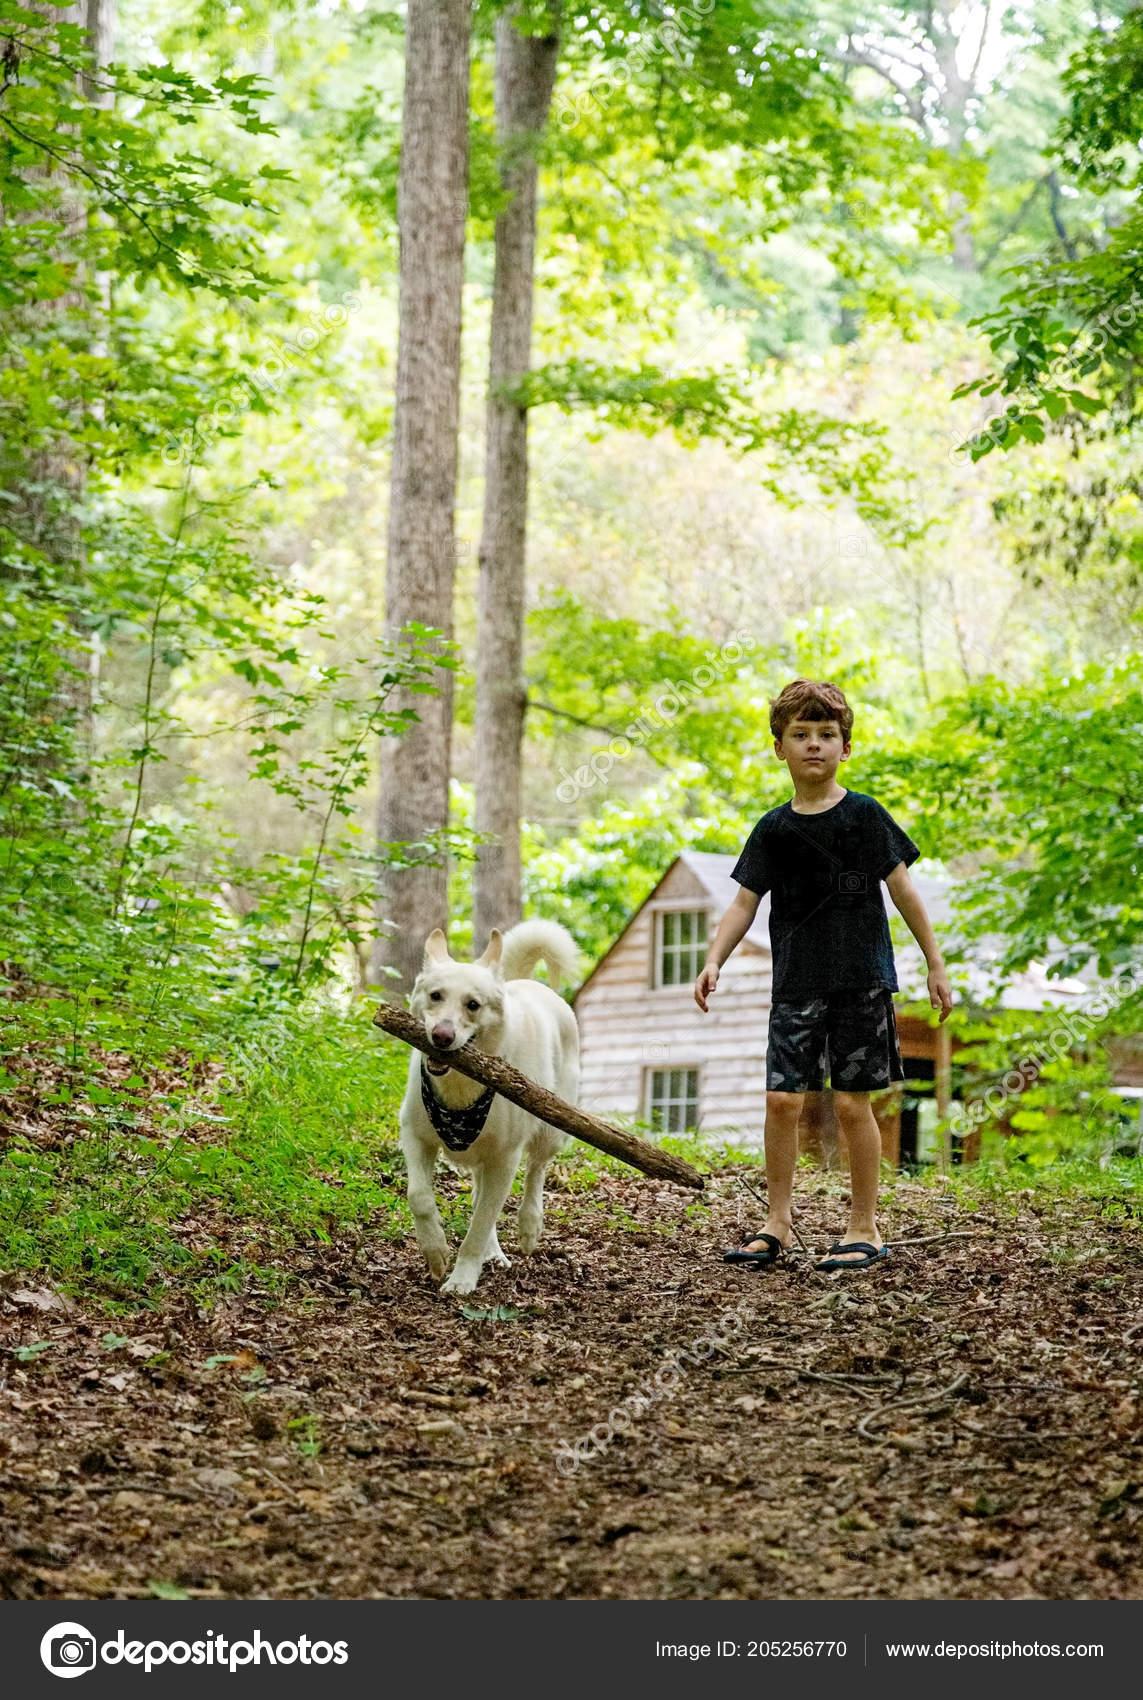 Cute Young Boy Large Breed White Dog Carrying Big Stick — Stock Photo ©  adogslifephoto #205256770